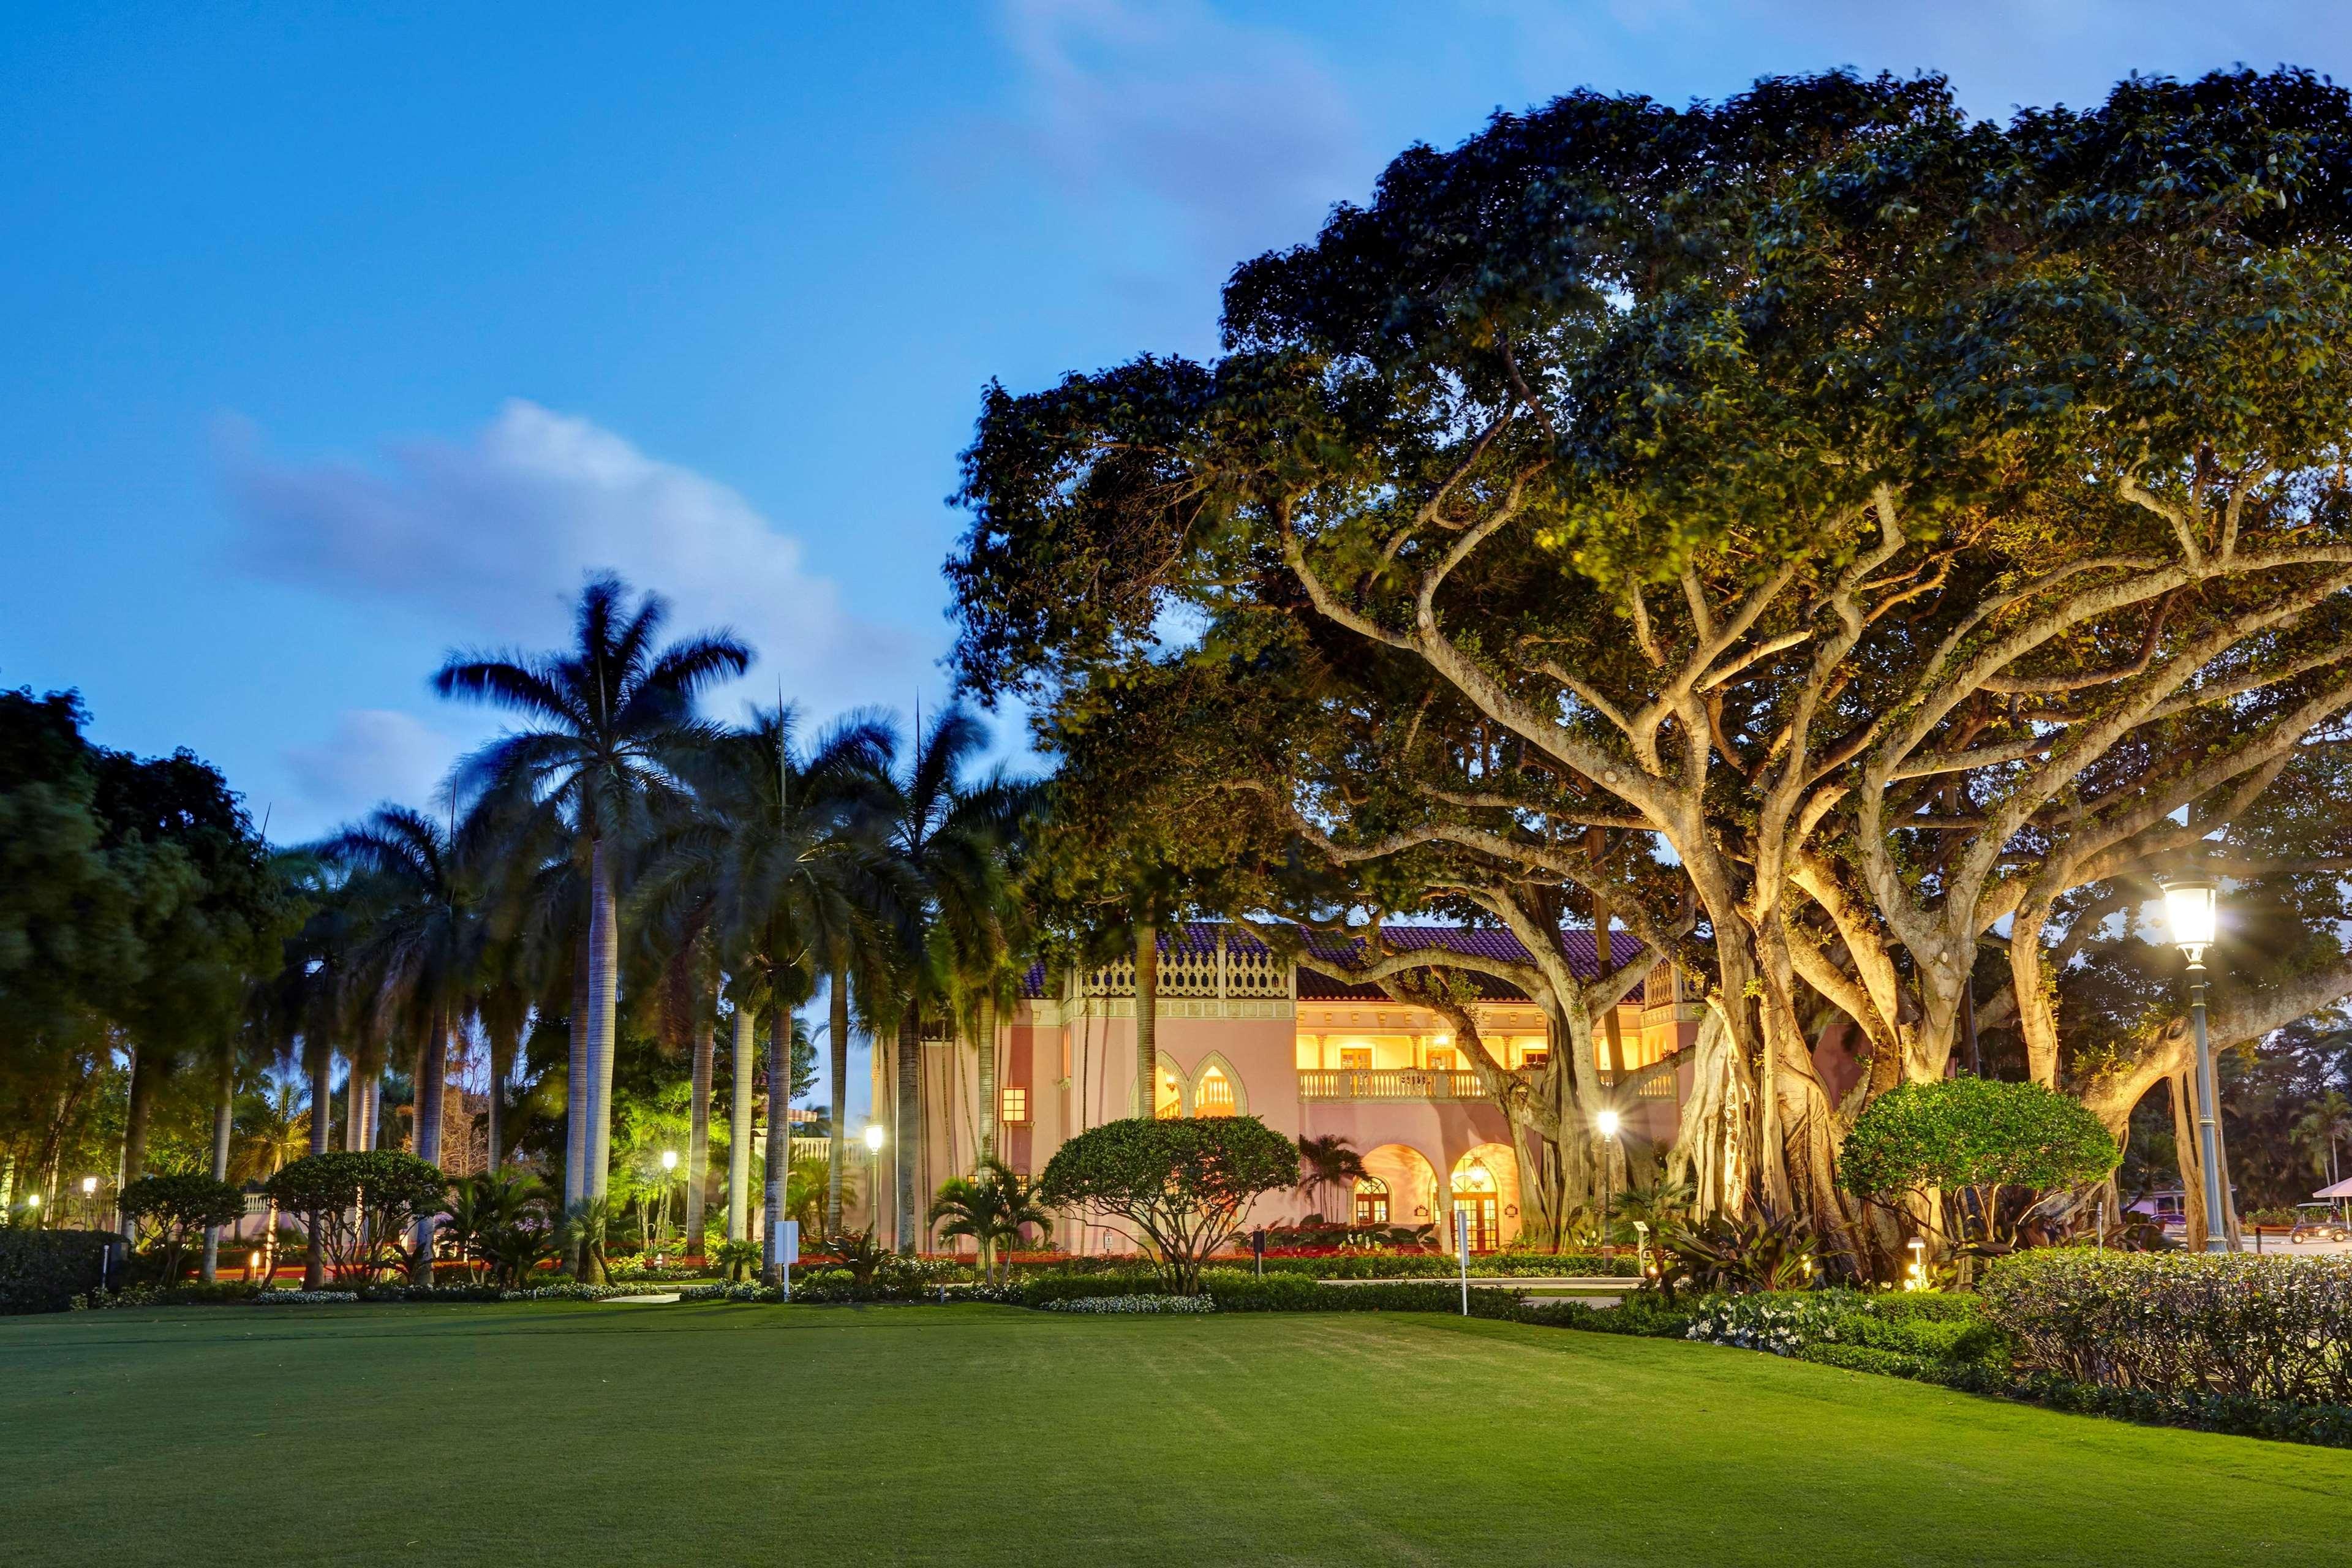 Clubs near: 8251 Aberdeen Dr, Boynton Beach, FL 33437 - MapQuest